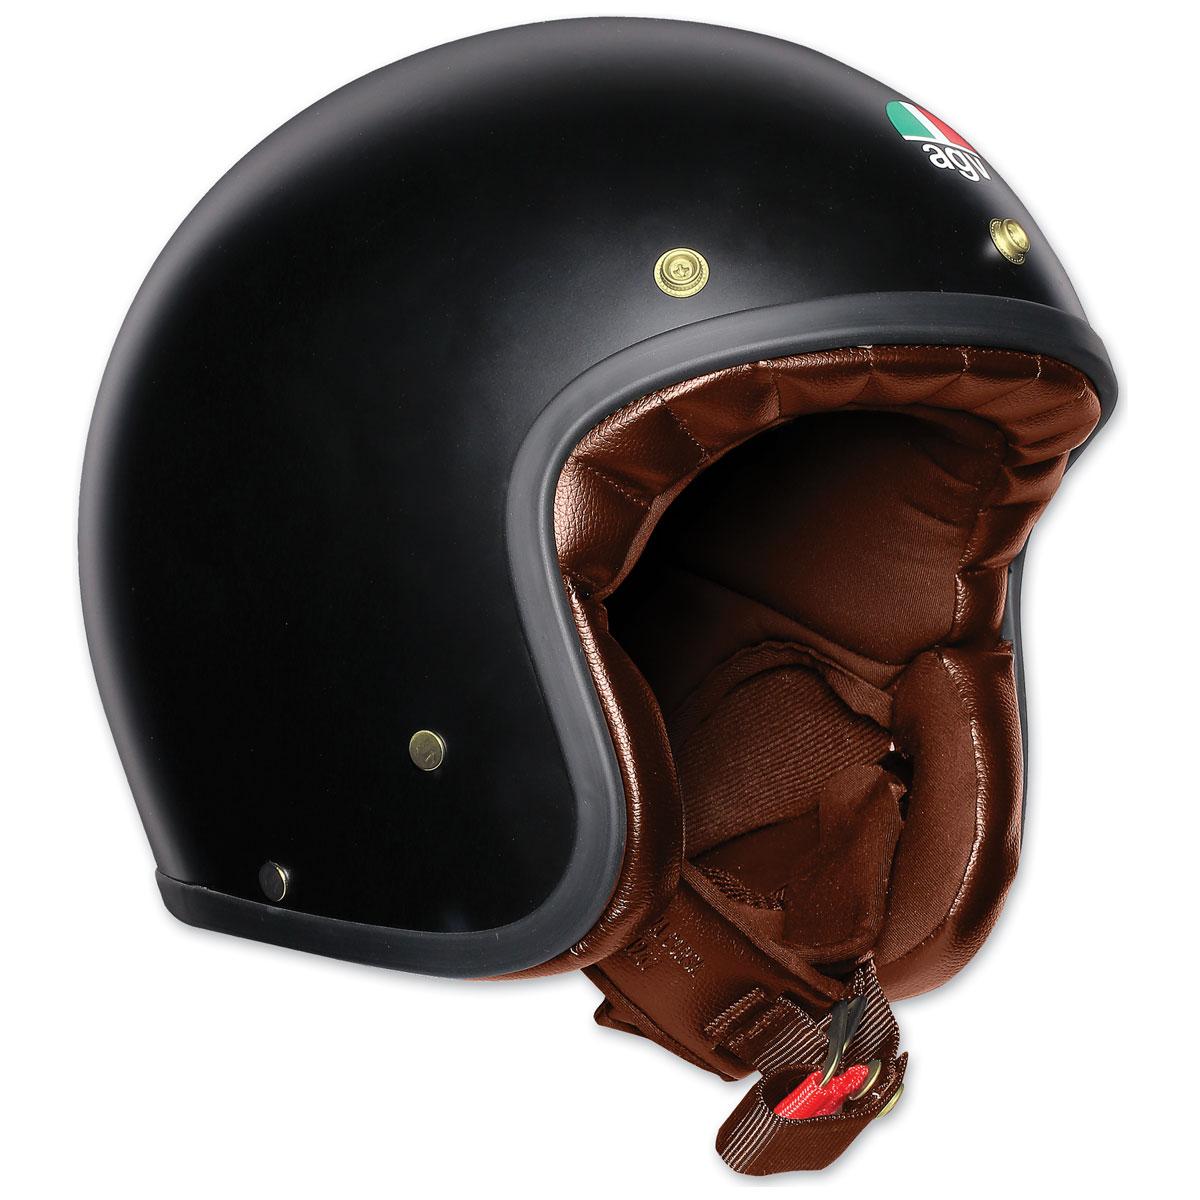 AGV X70 Matte Black/Gold Open Face Helmet